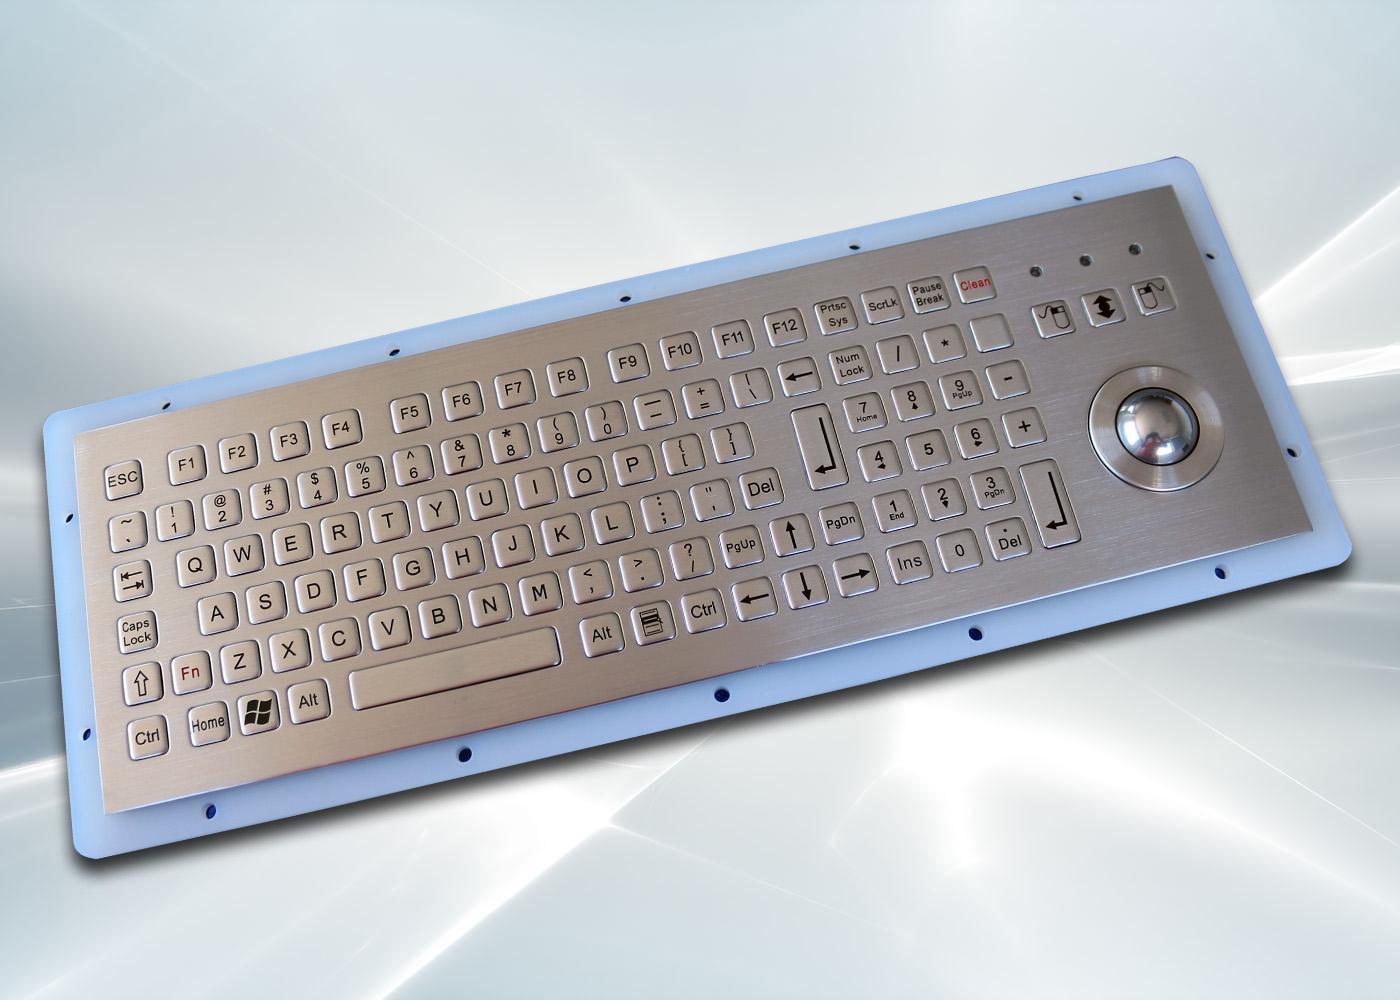 Clavier inox 104 touches avec trackball 25mm – vue d'ensemble